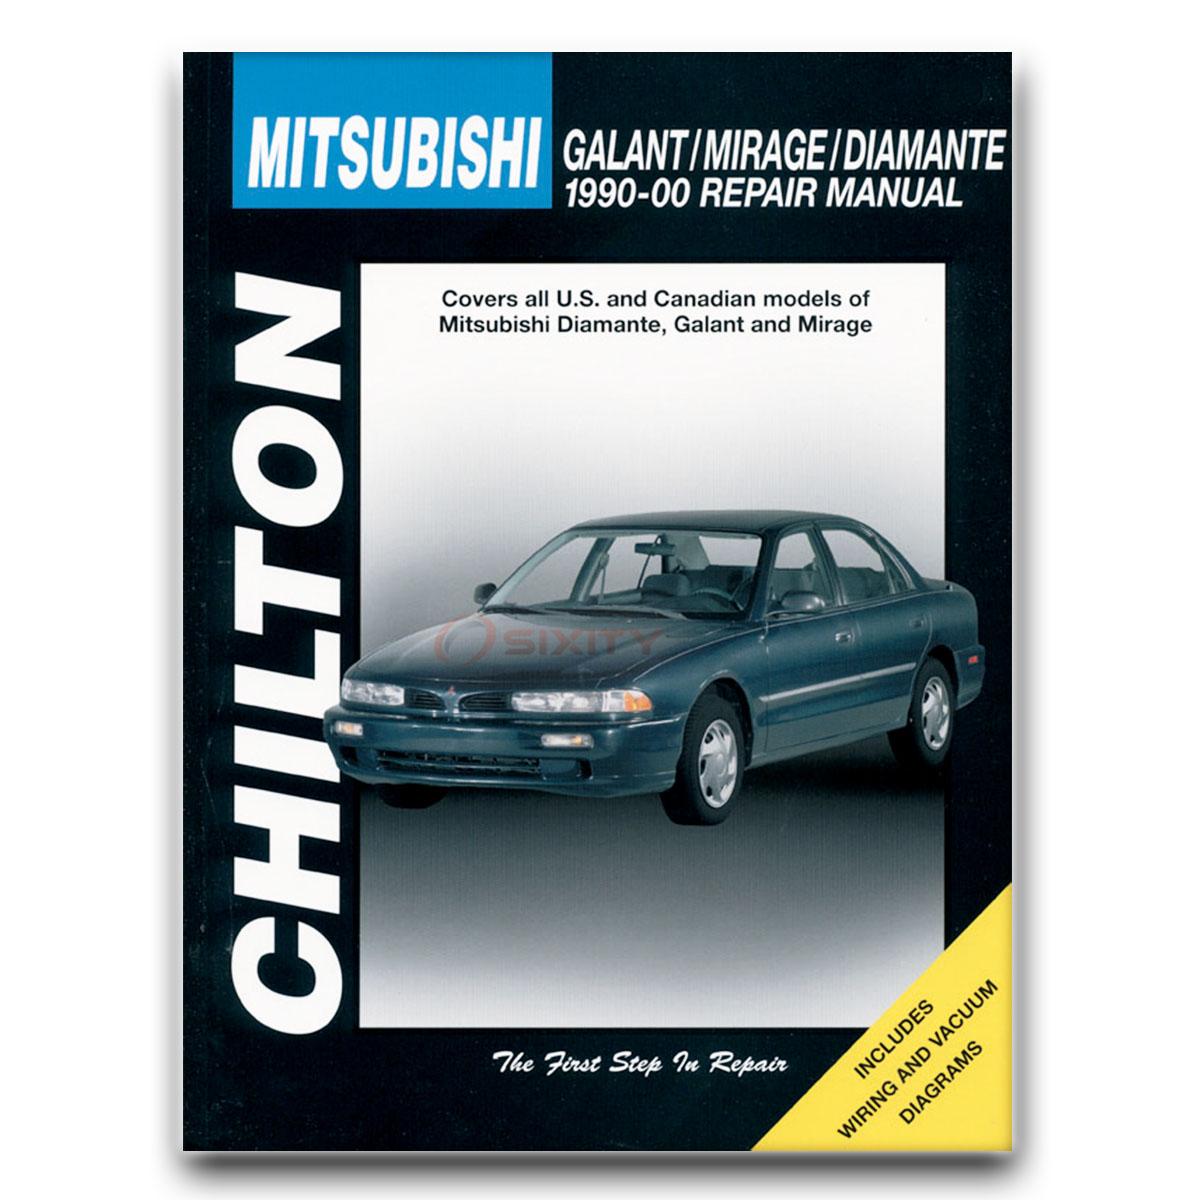 mitsubishi galant chilton repair manual vr 4 gsx ls gsr de gtz base rh ebay com Mitsubishi Galant Transmission Standard Mitsubishi Galant Transmission Standard